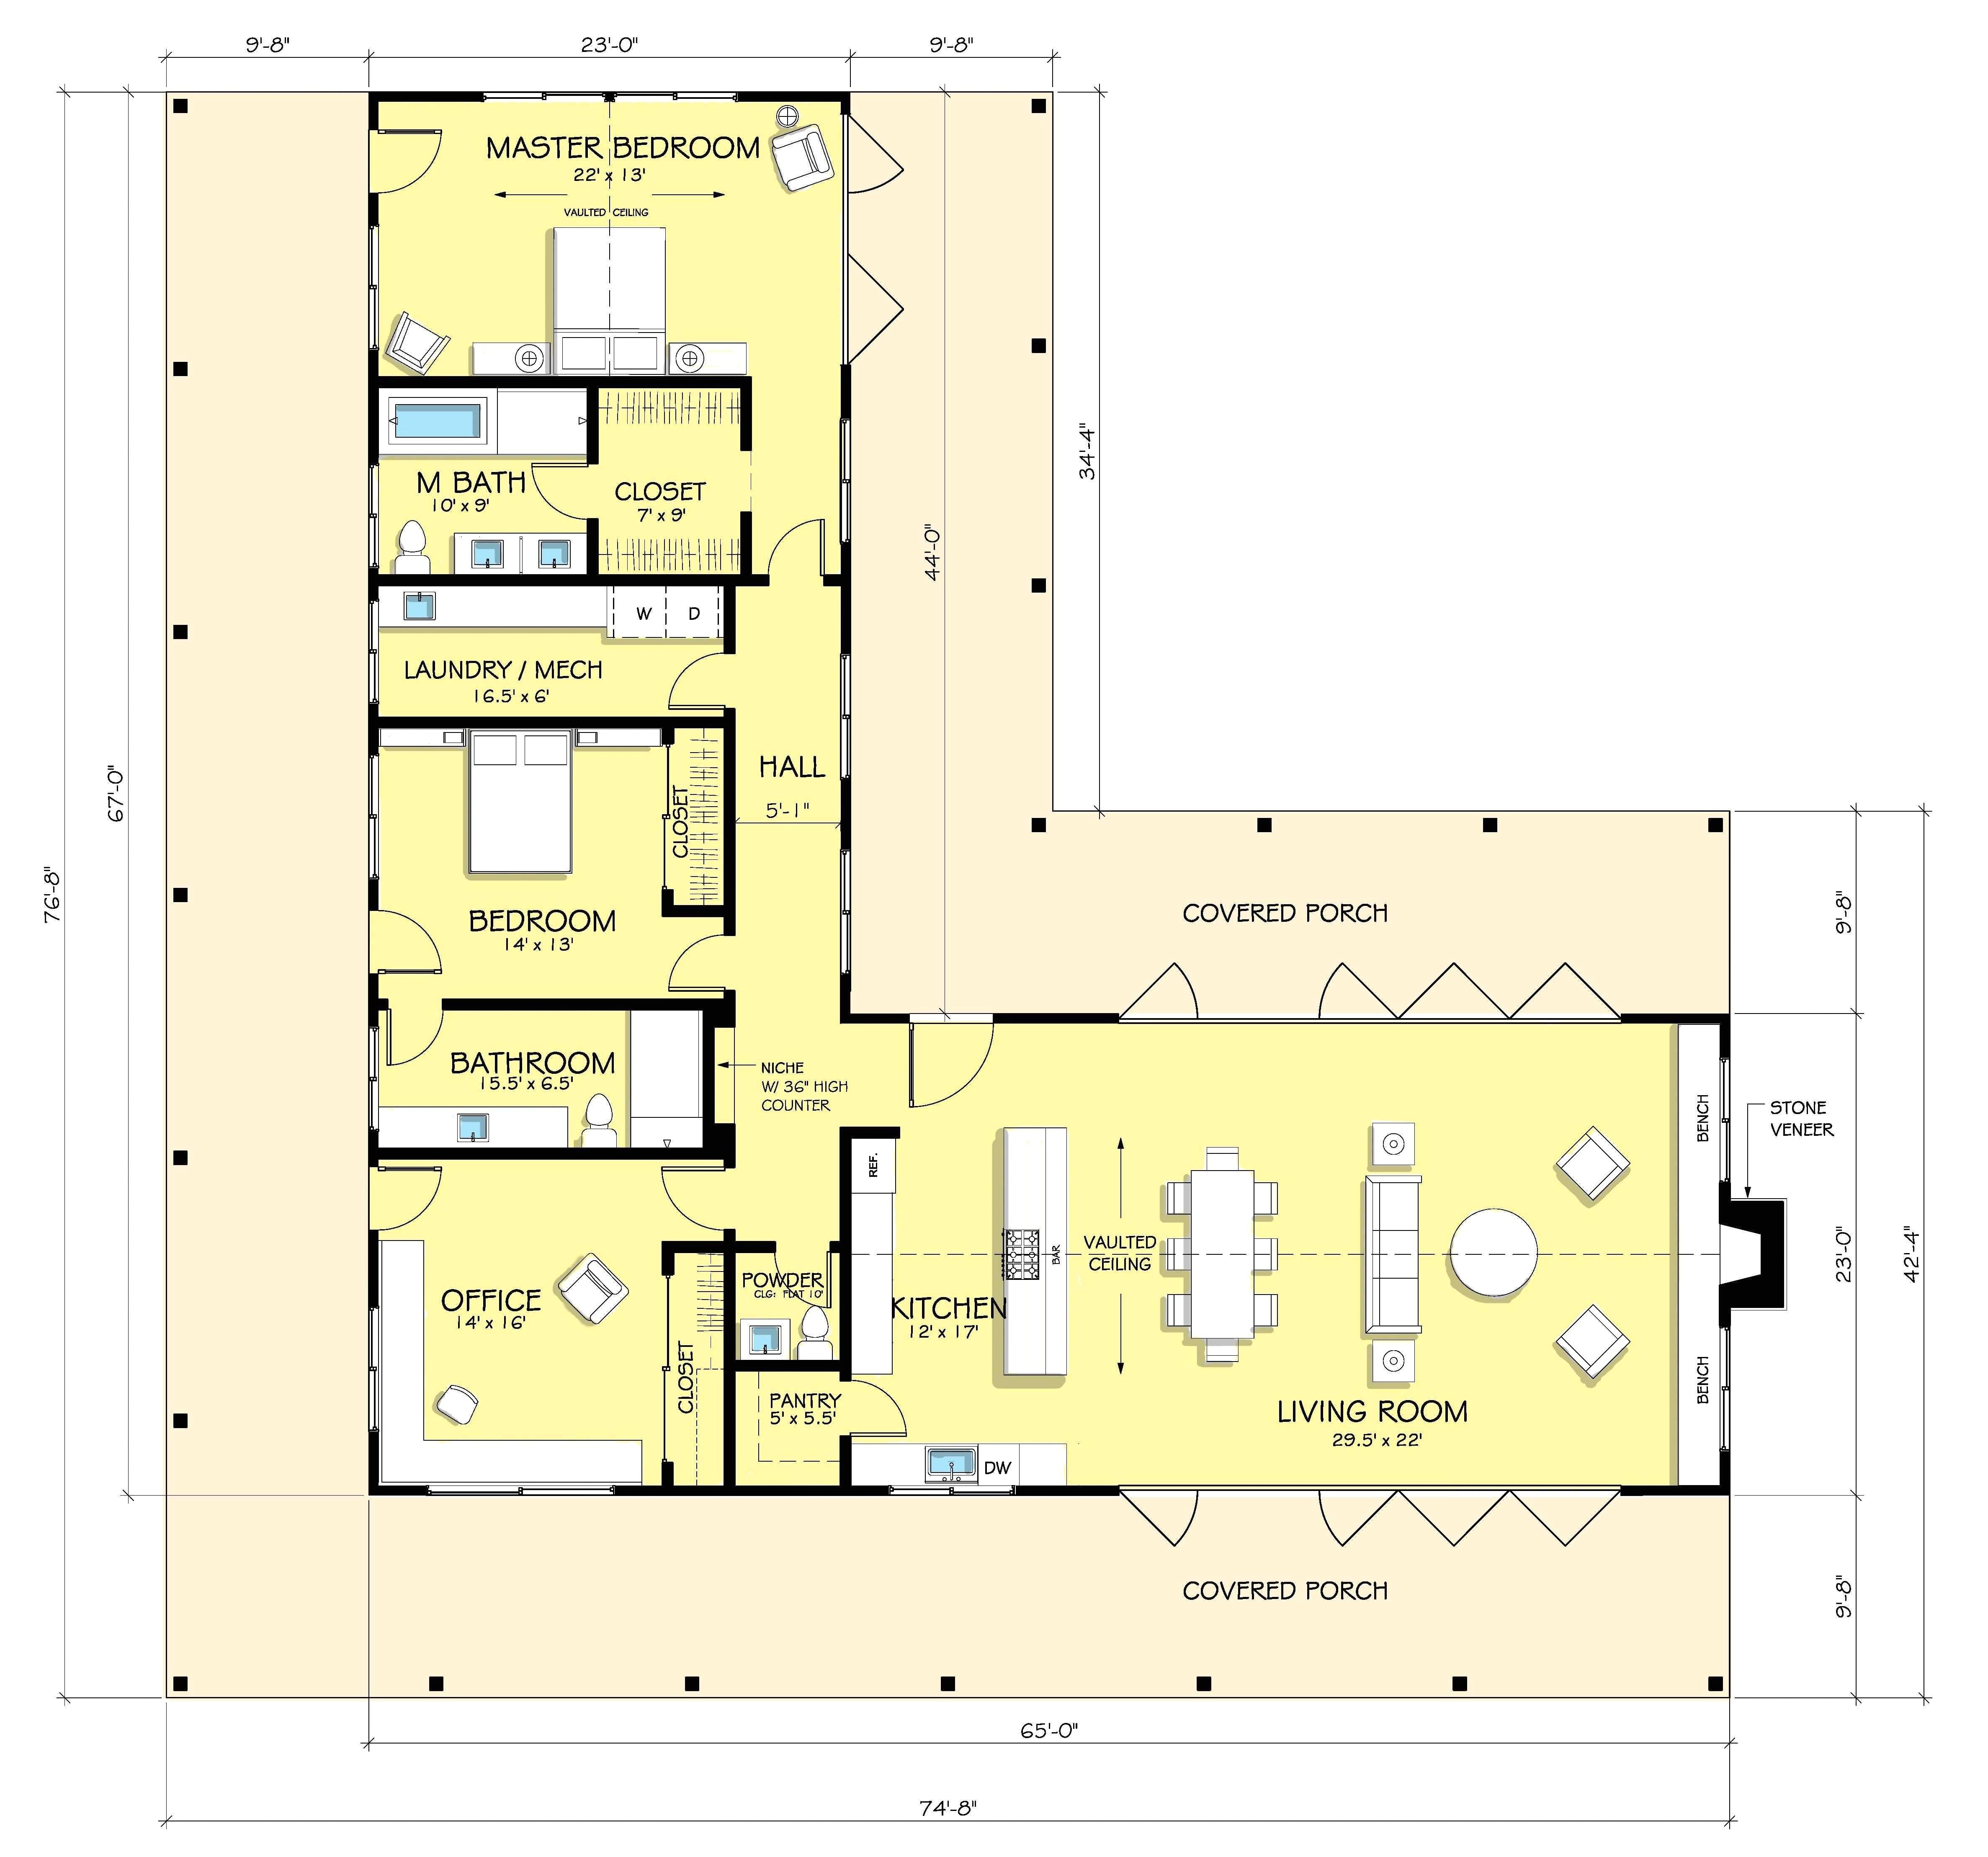 ranch house plan inspirational simple plan for house simple floor plans best design plan 0d house